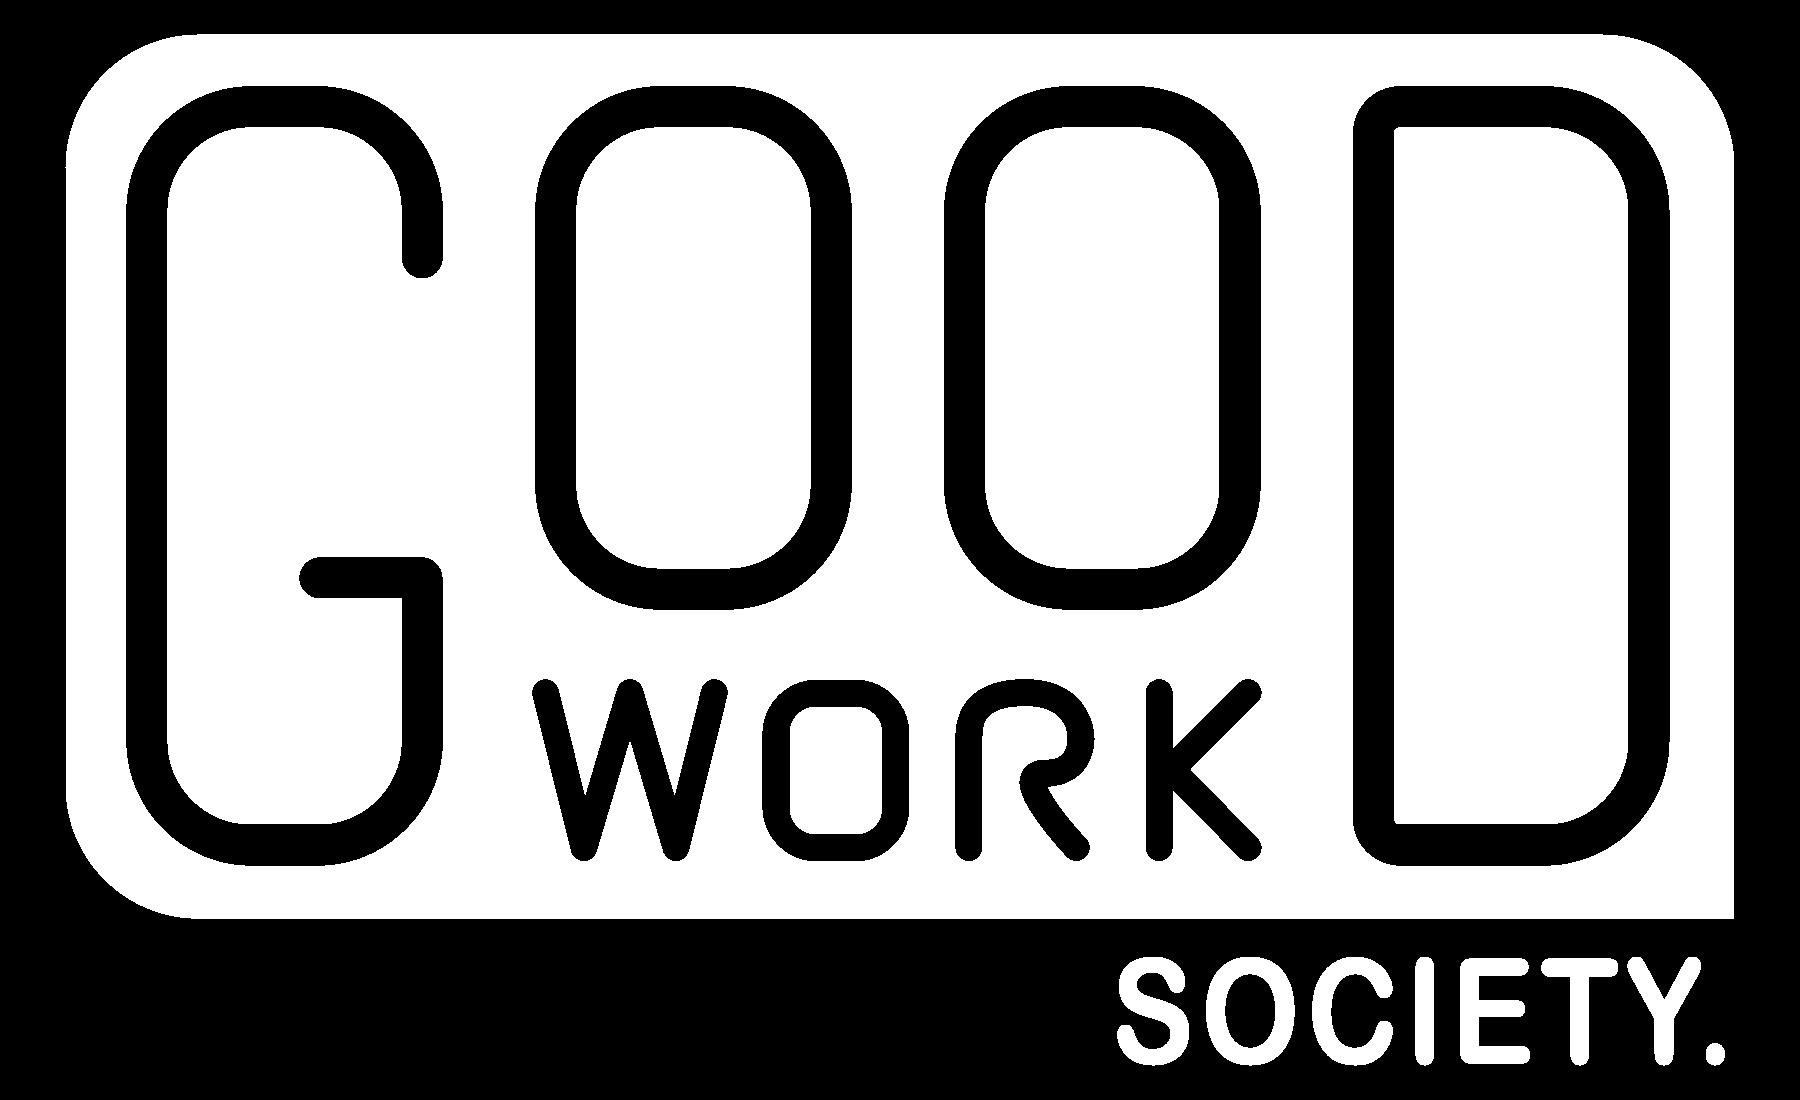 Good Work Society